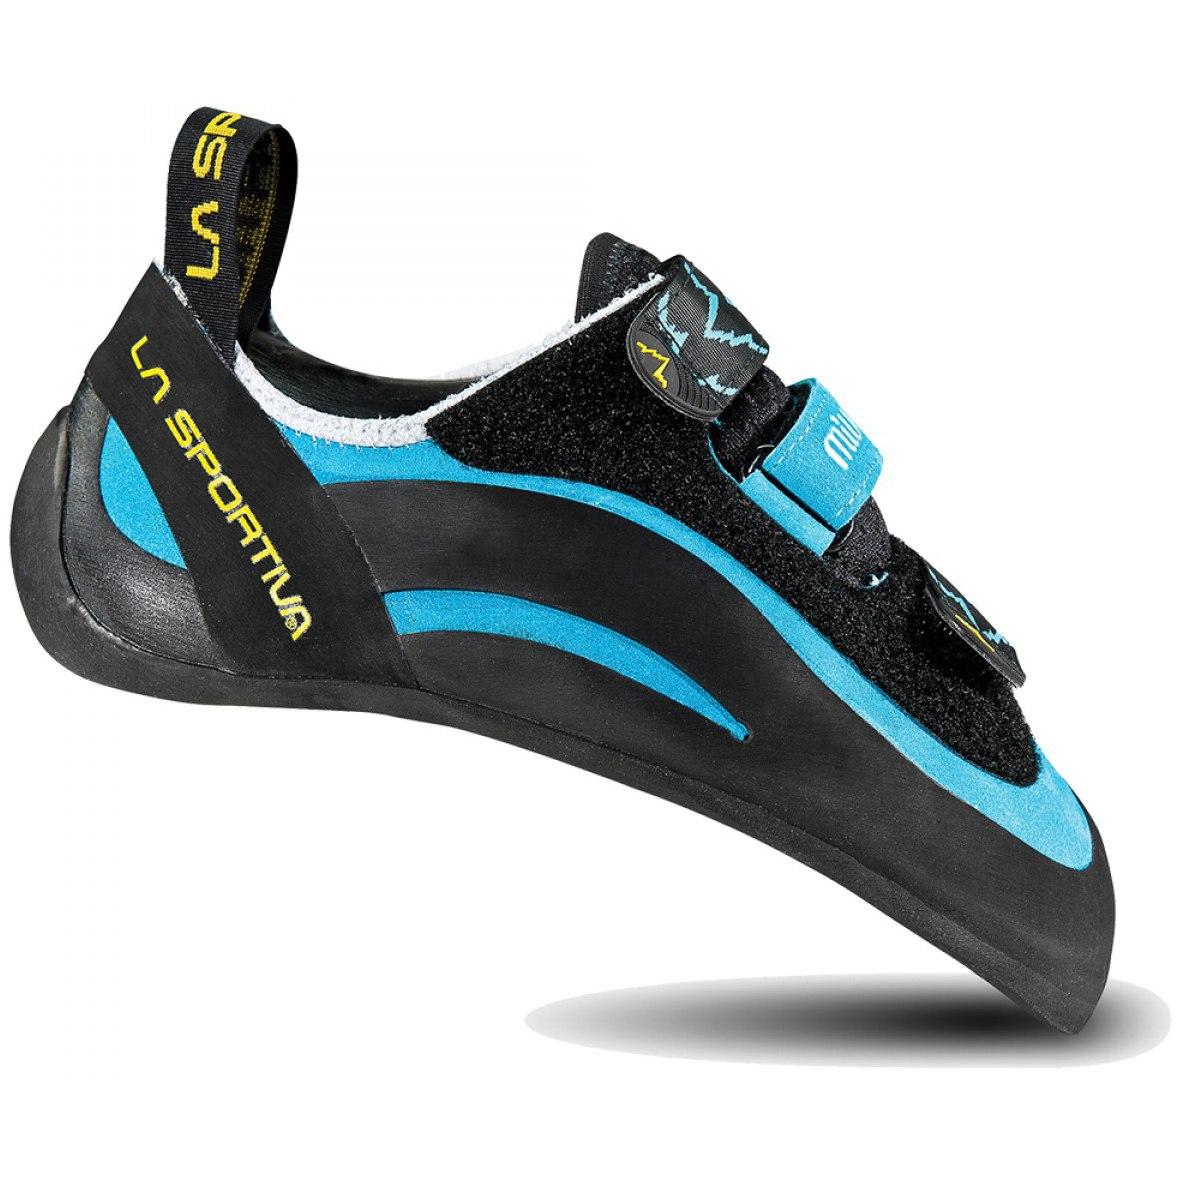 La Sportiva Miura VS Kletterschuhe Damen - Blue